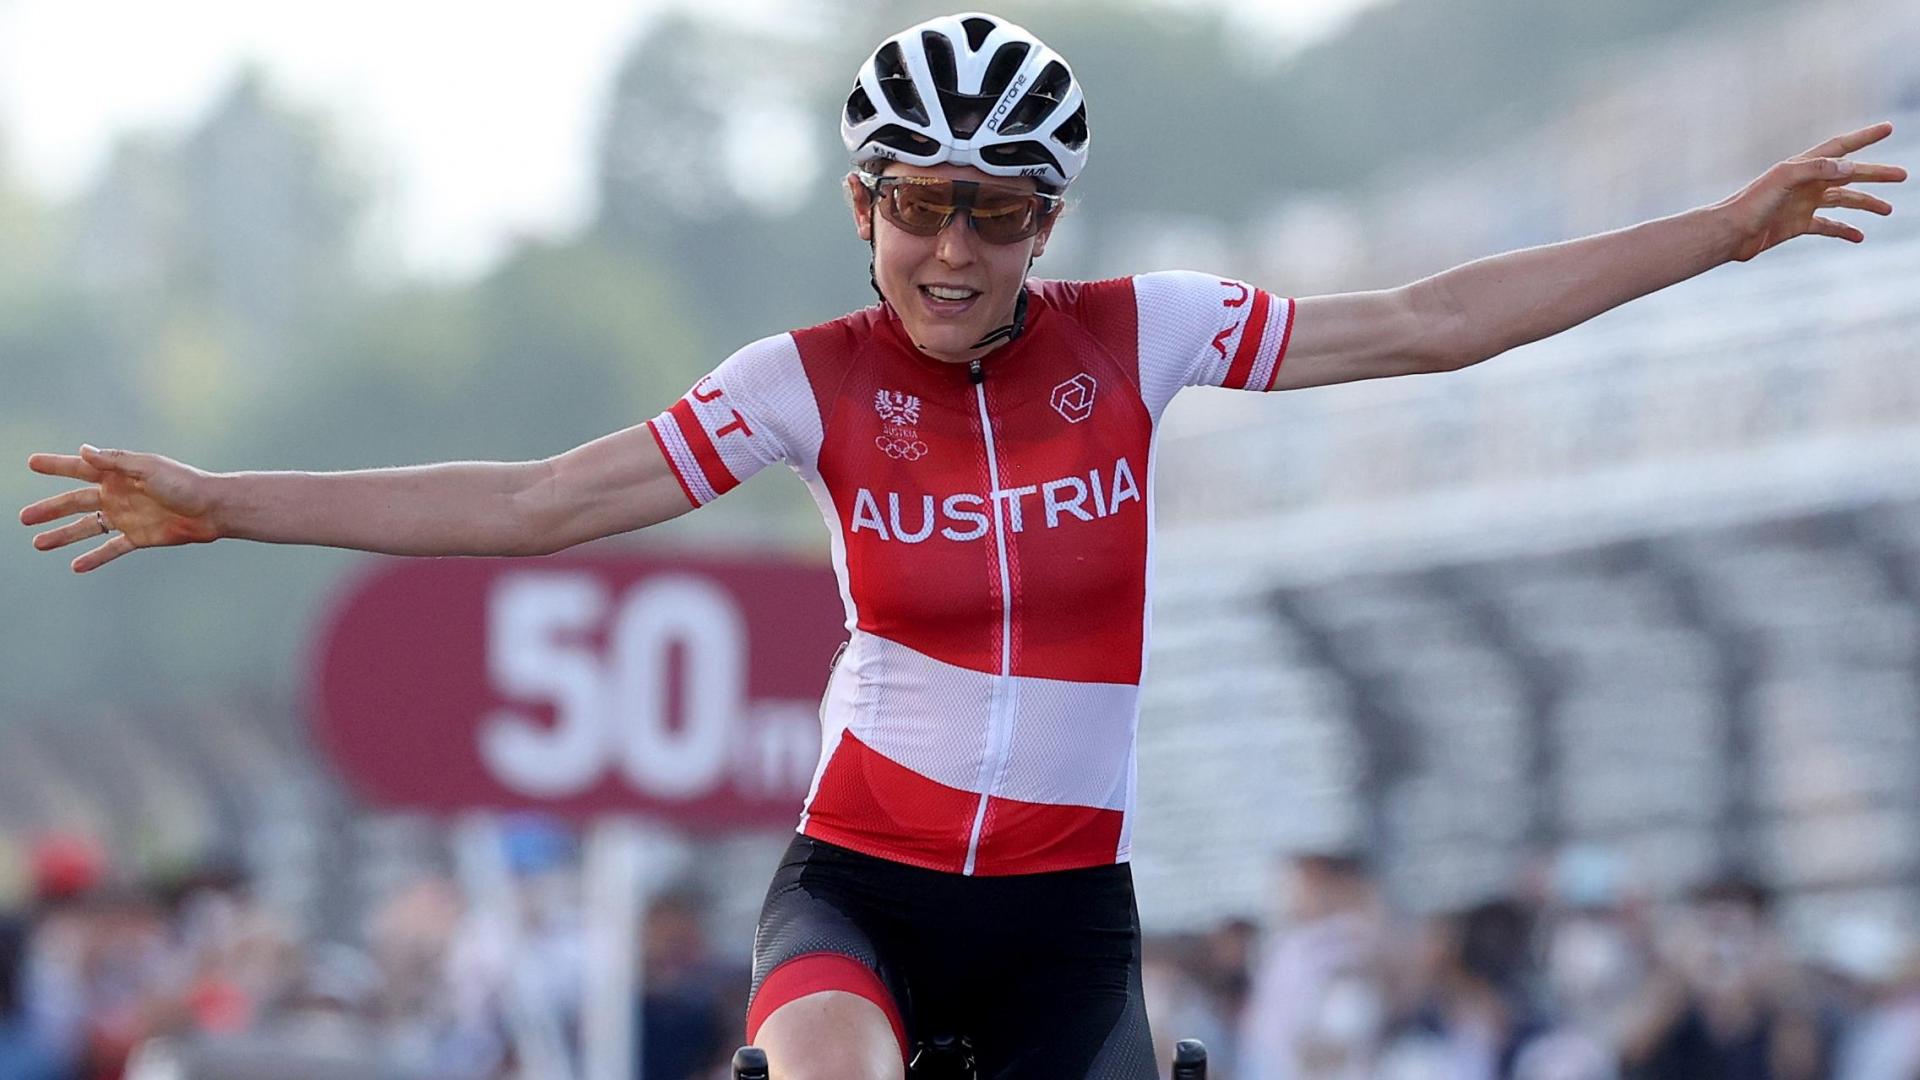 Tokyo Olympics 2020 Update: Anna Kiesenhofer Wins Shock Road Race Gold